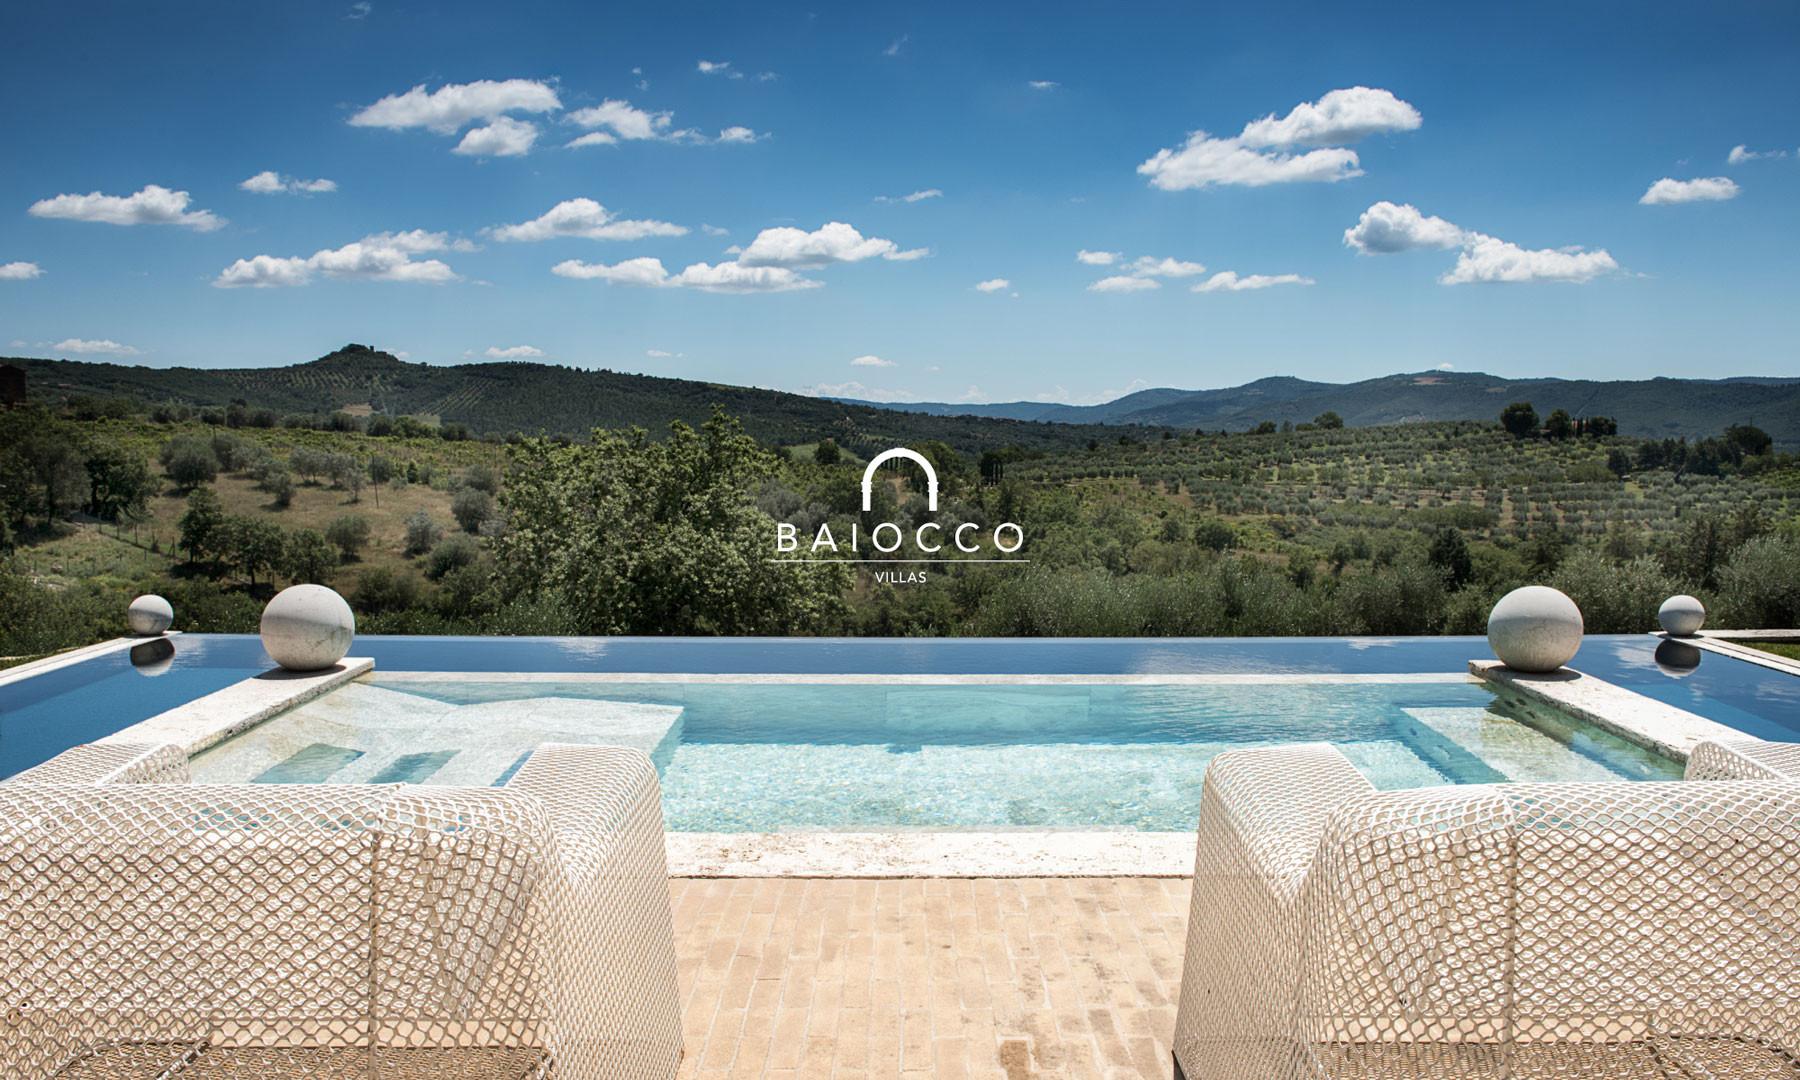 baiocco-villas-swimming-poolLOW.jpg